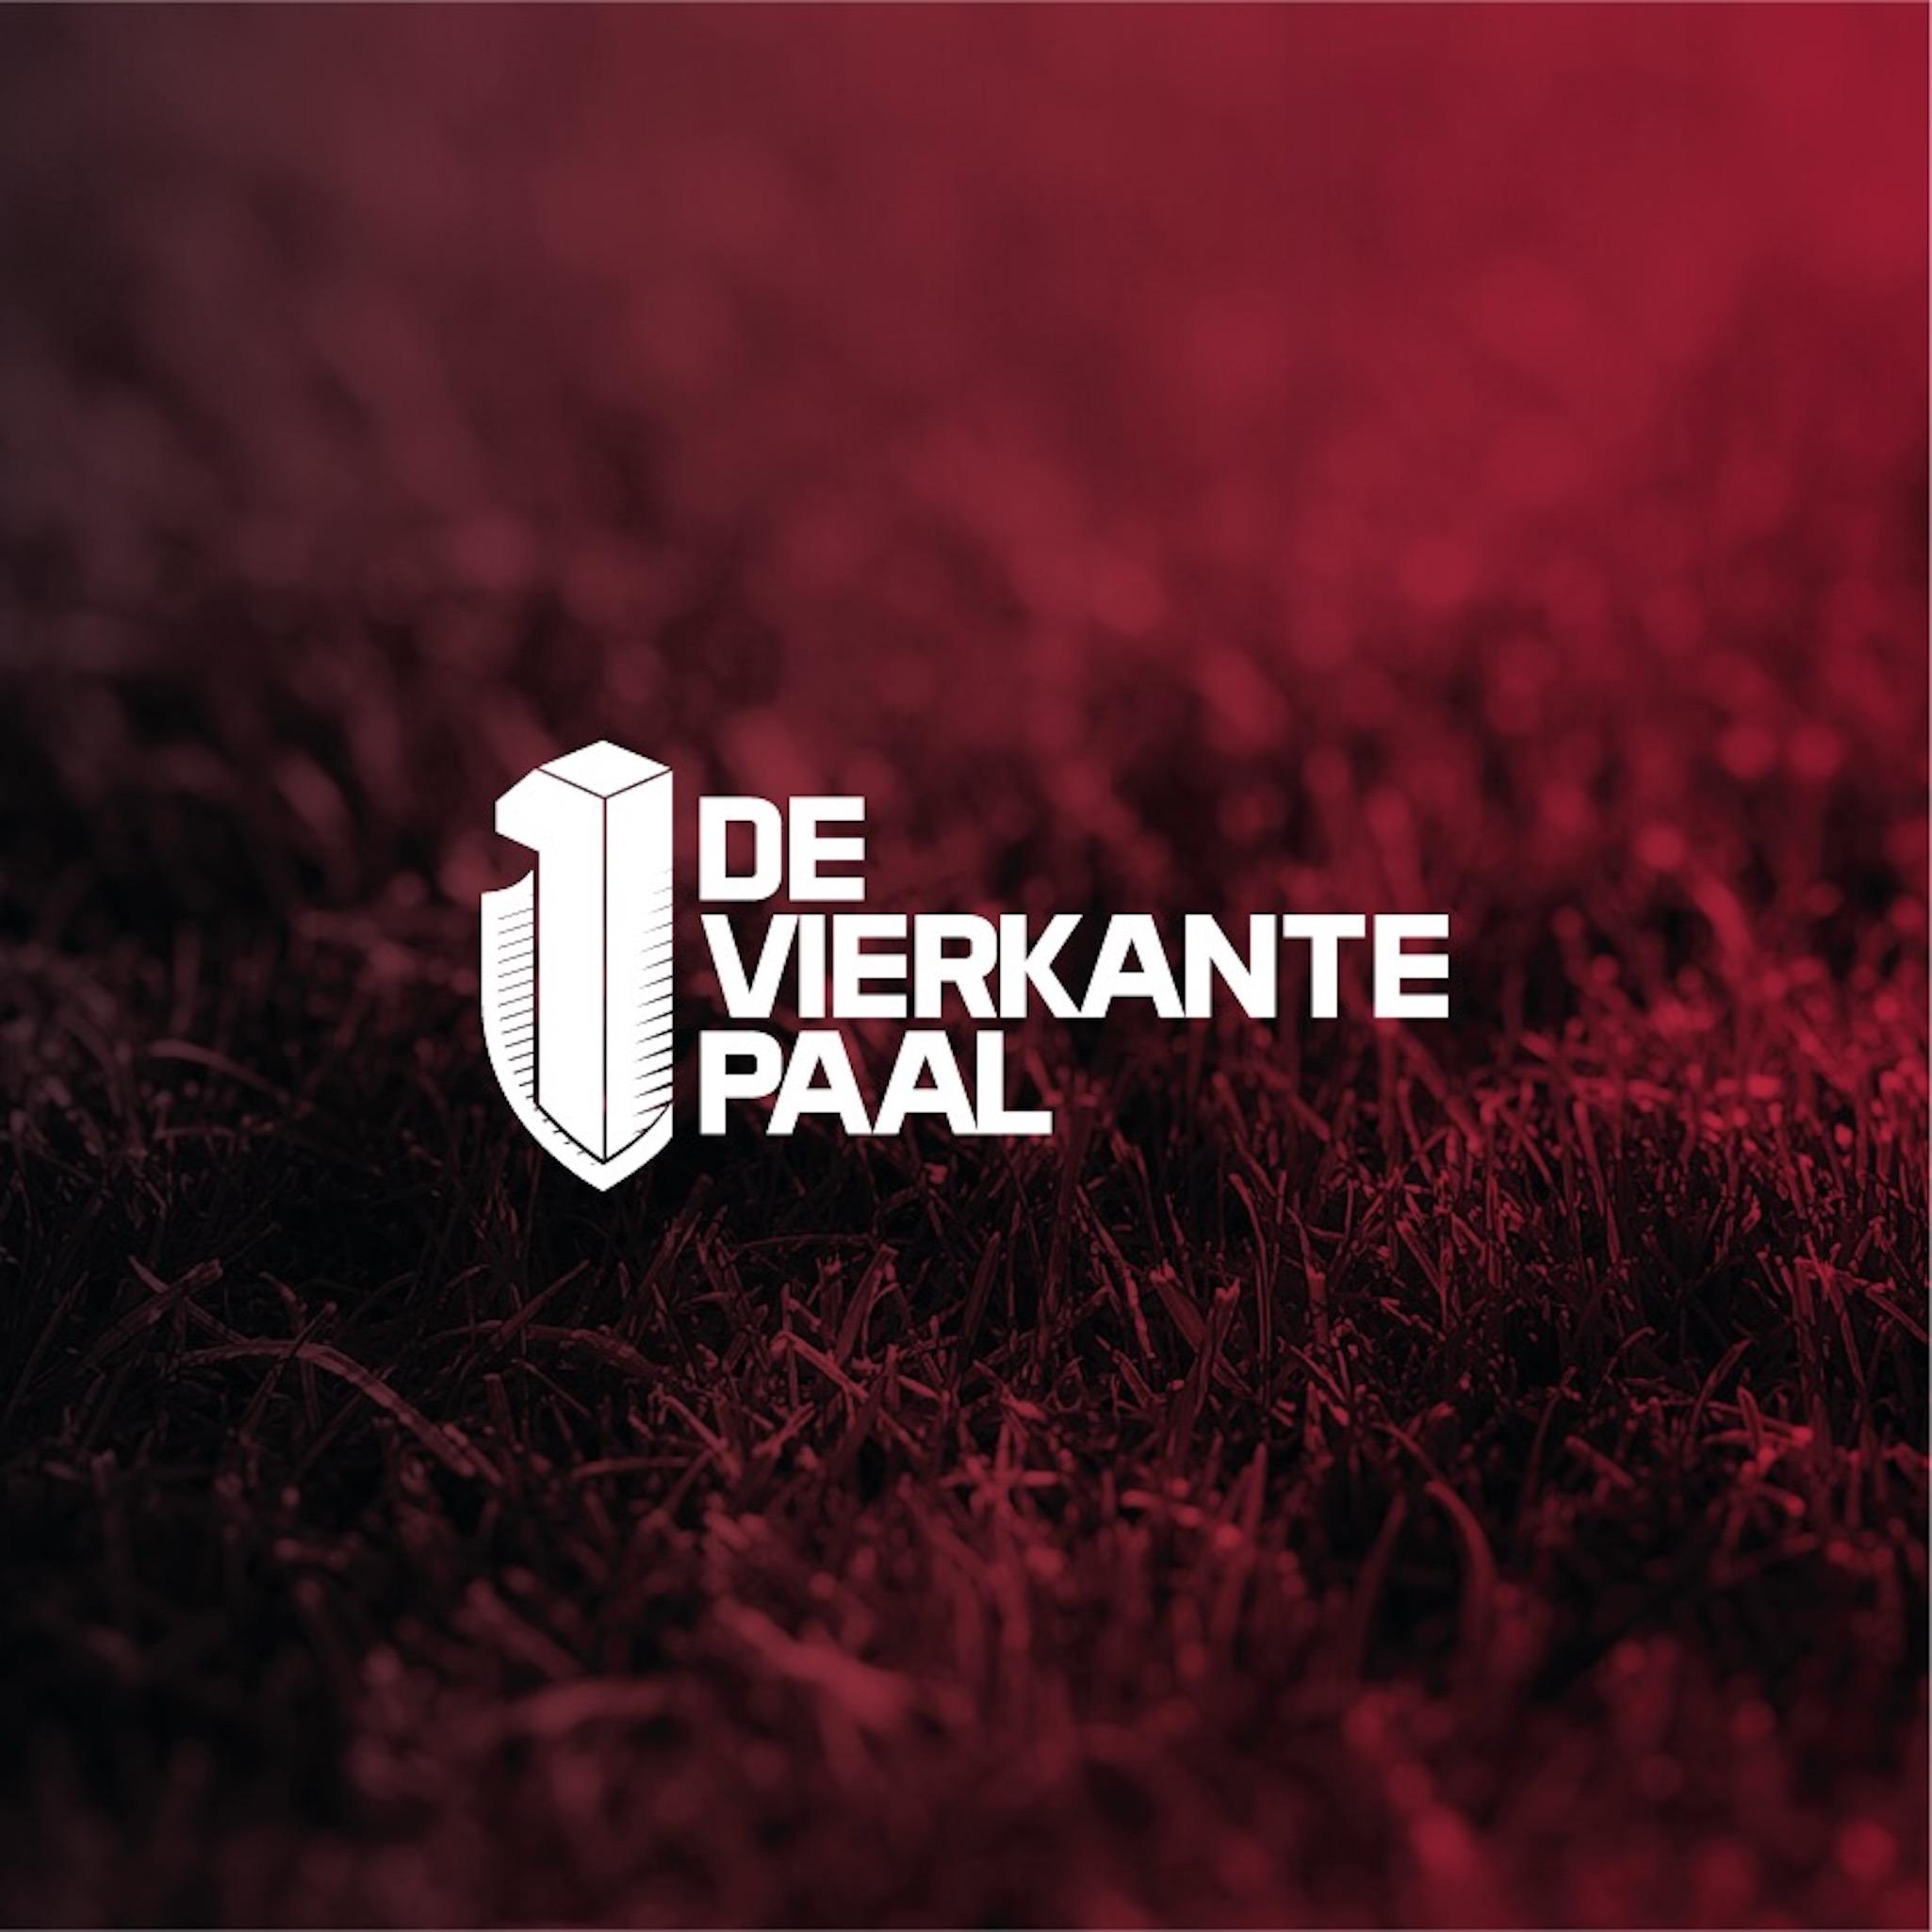 De Vierkante Paal logo